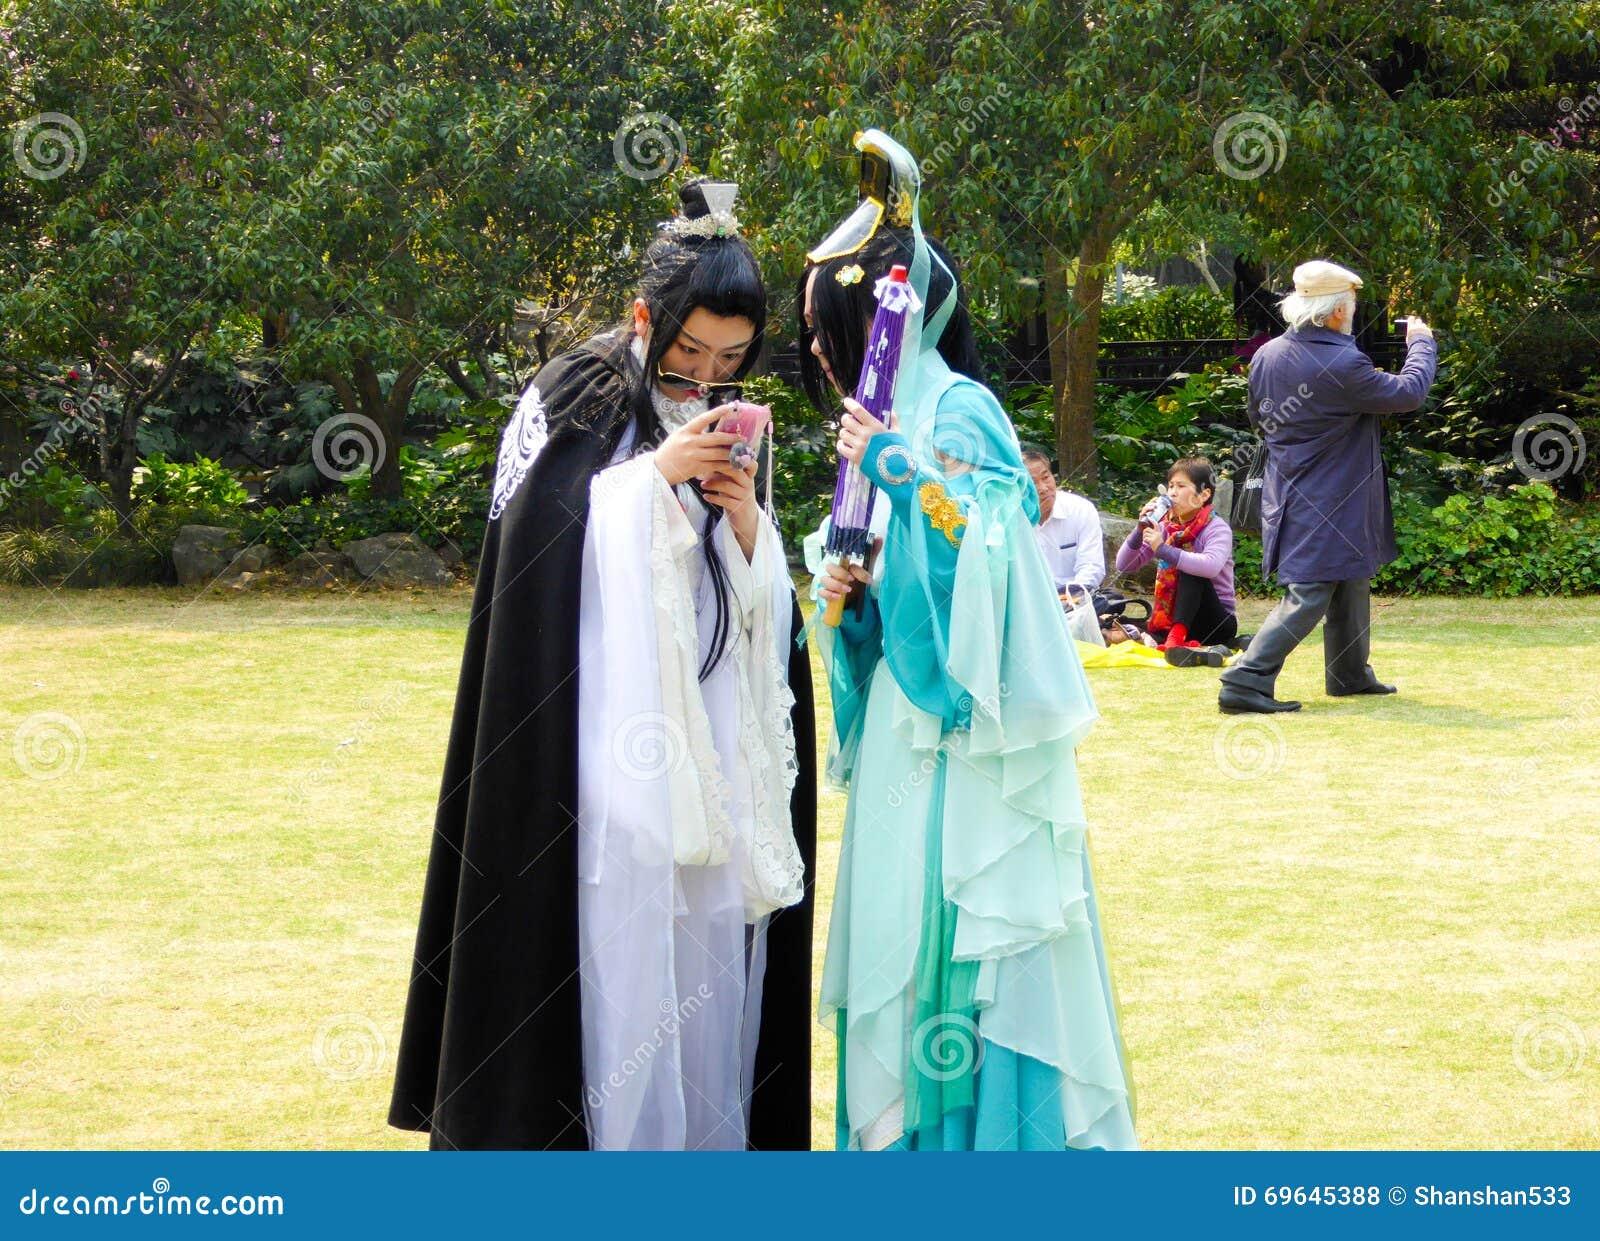 Costume Play Editorial Stock Photo - Image: 69645388